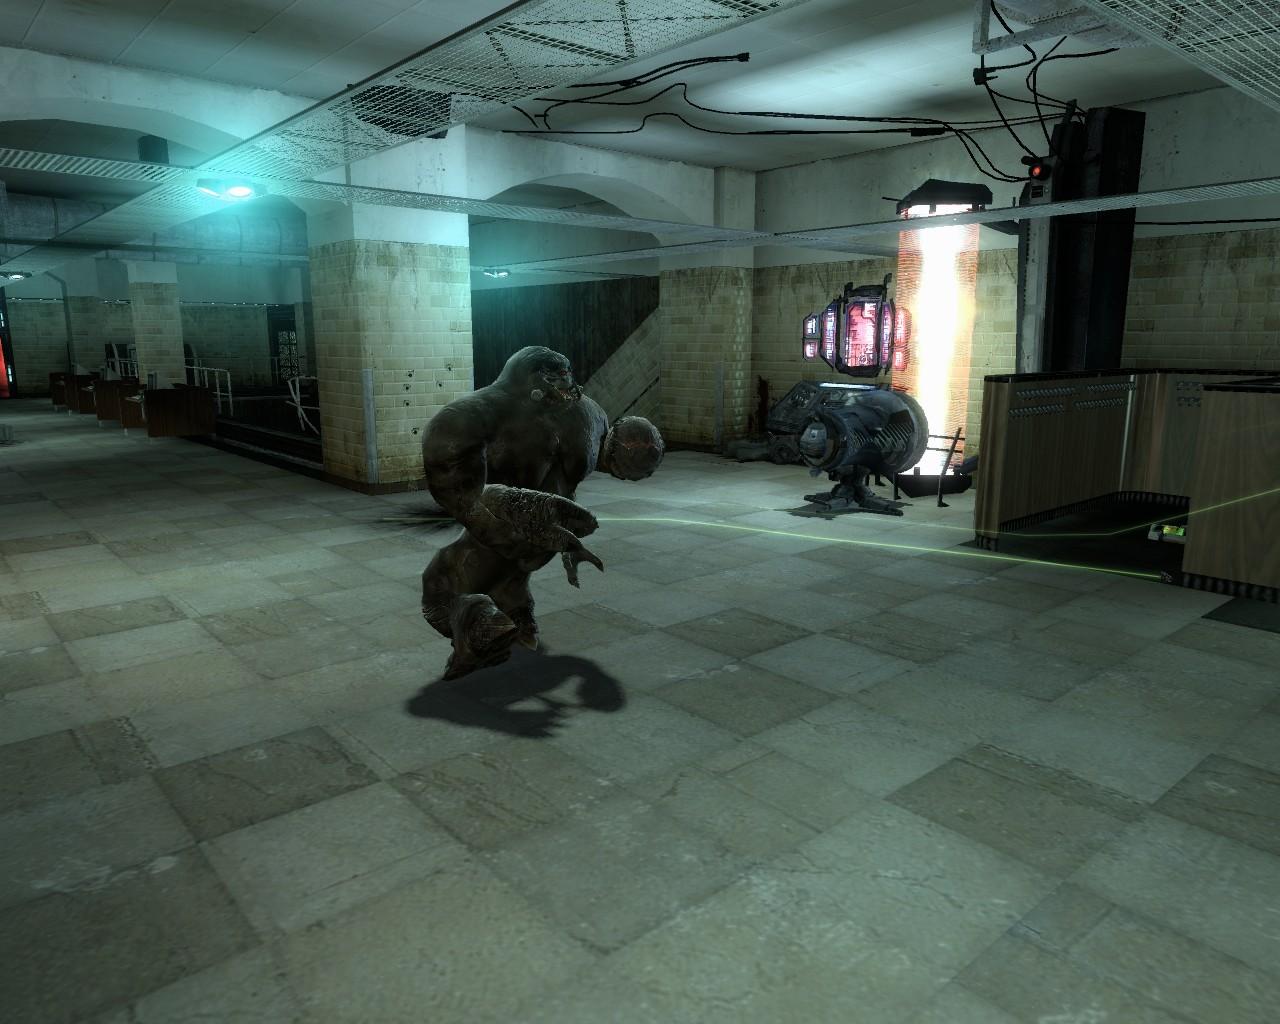 Игра:nightmare house 2 умничка: у босса др и он уже упоролся